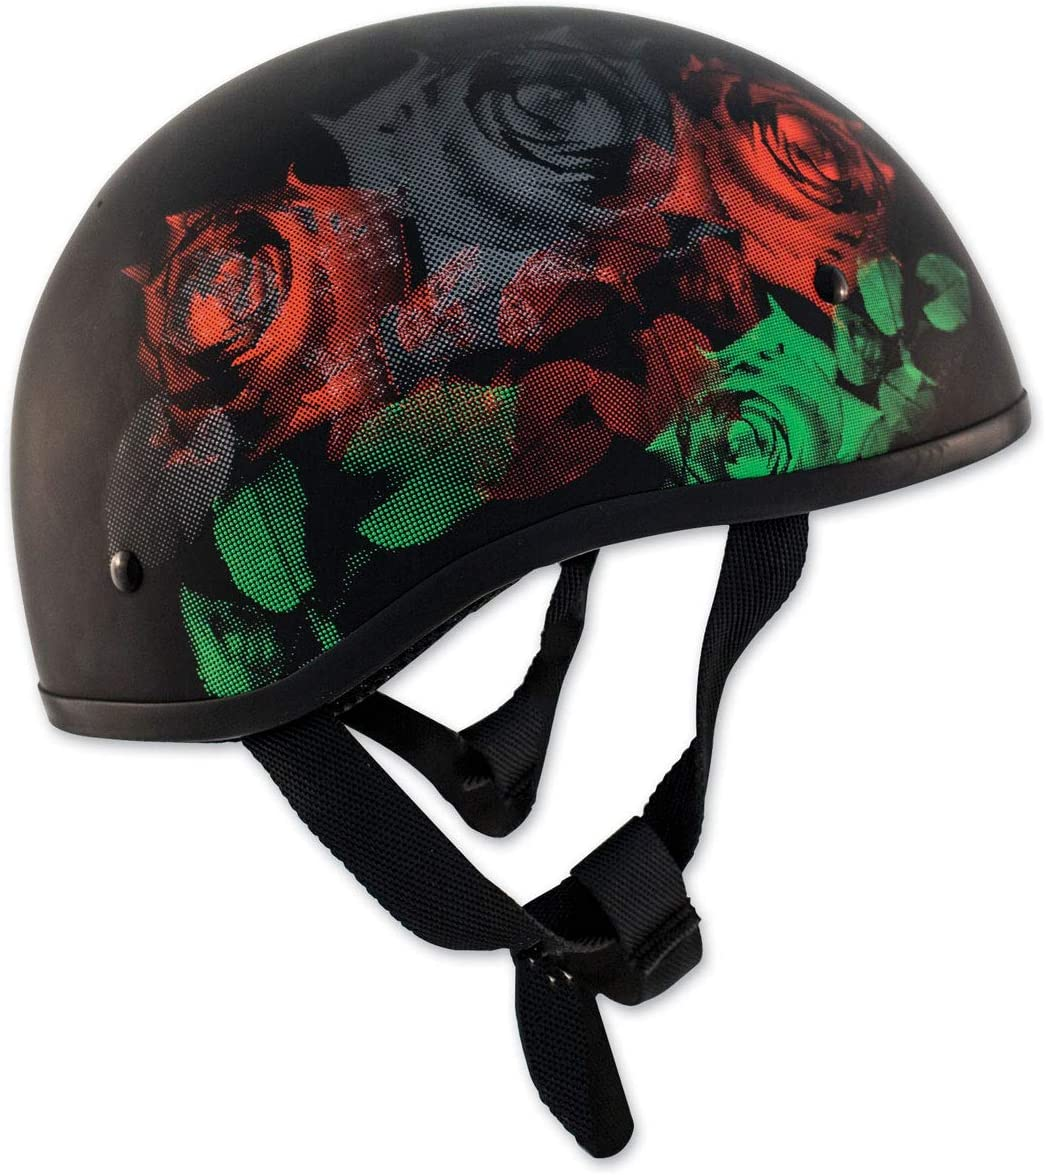 Zox Retro Old School Roses Matte Black Half Helmet 88-34165